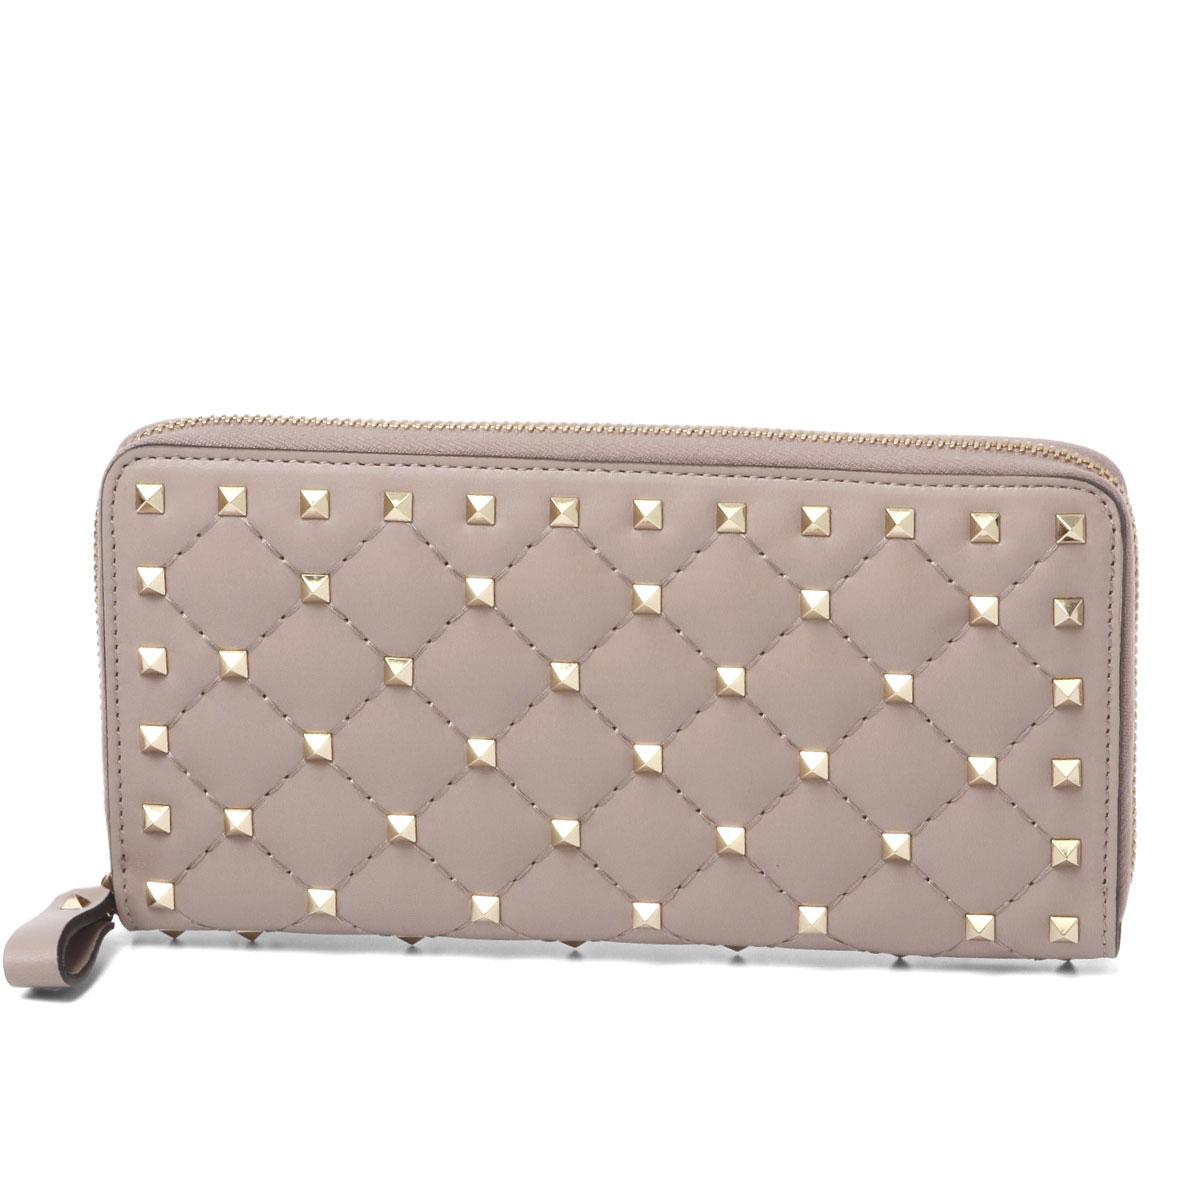 c0cc4ddc709c1 Valentino VALENTINO wallet Lady's PW2P0P00NAP P45 round fastener long  wallet ROCKSTUD SPIKE lock stud bolt spikes ...